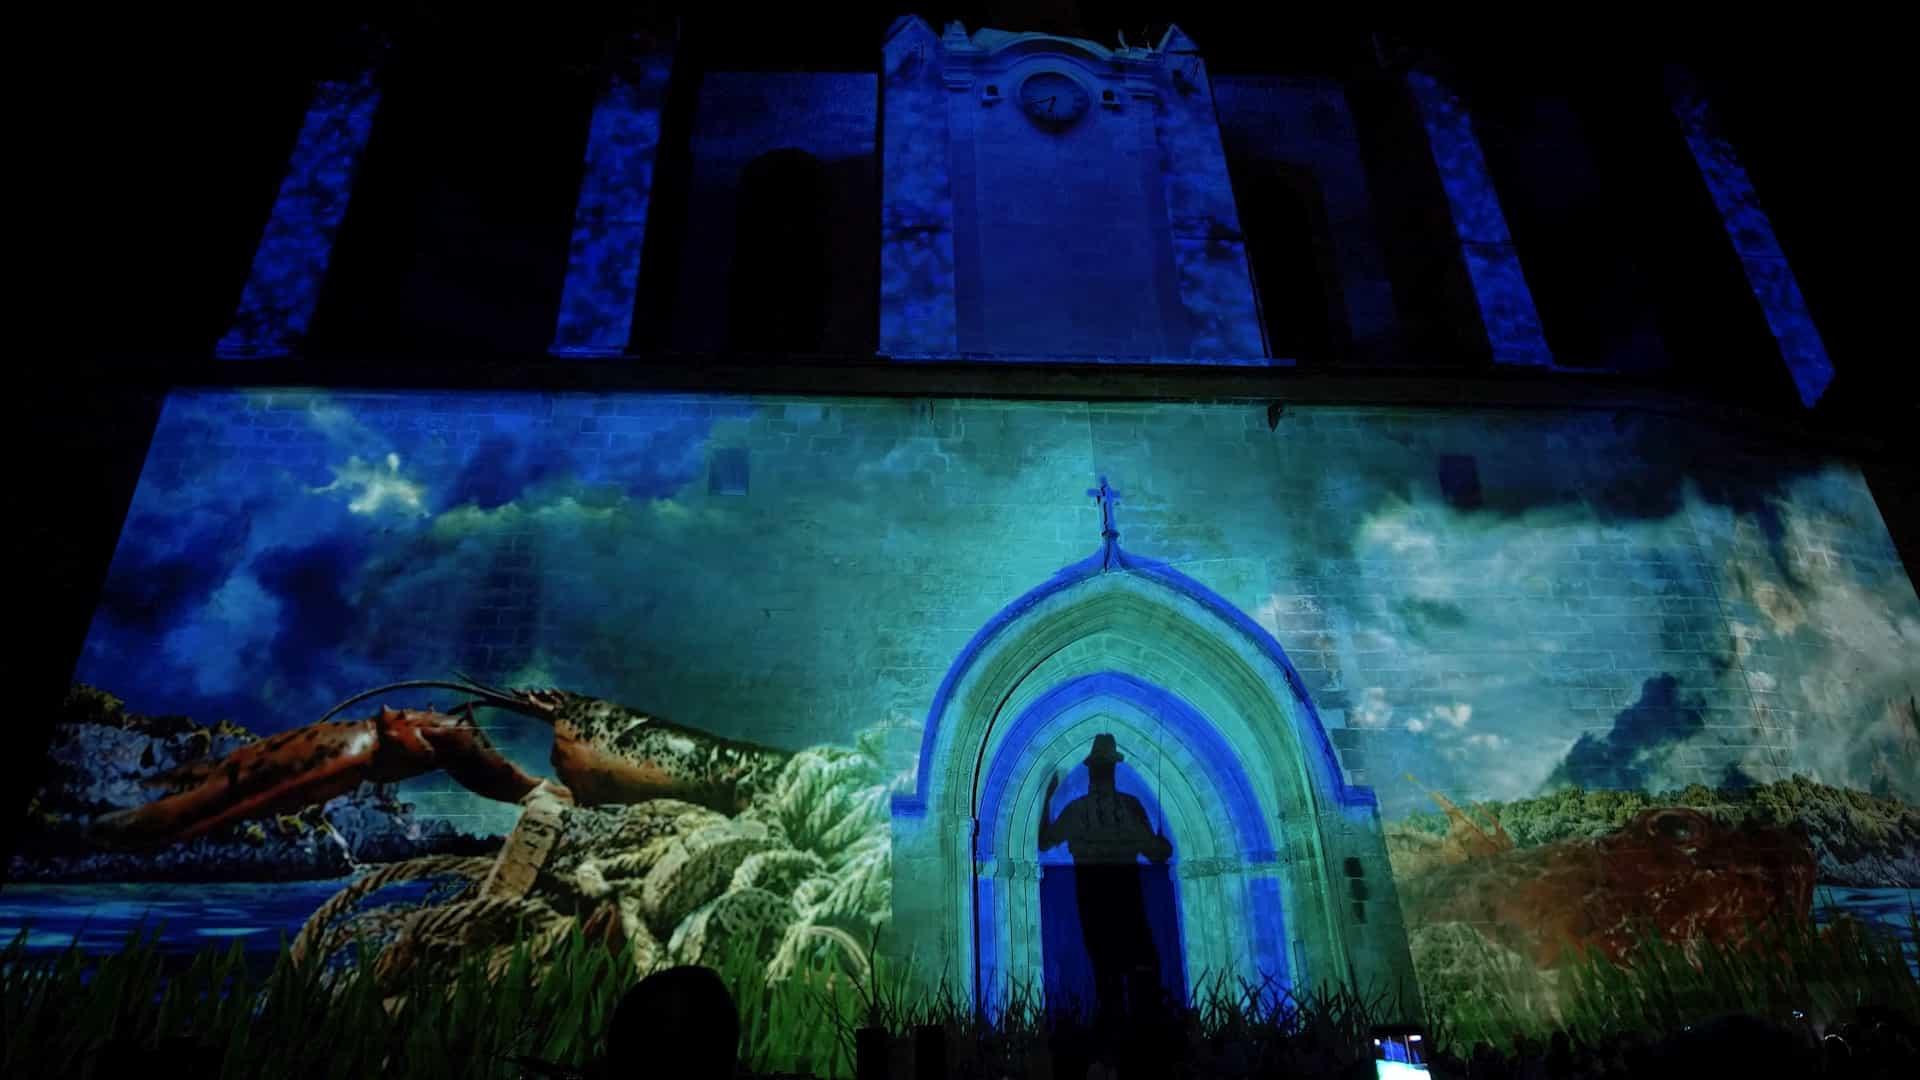 25 aniversario Menorca Reserva Biosfera